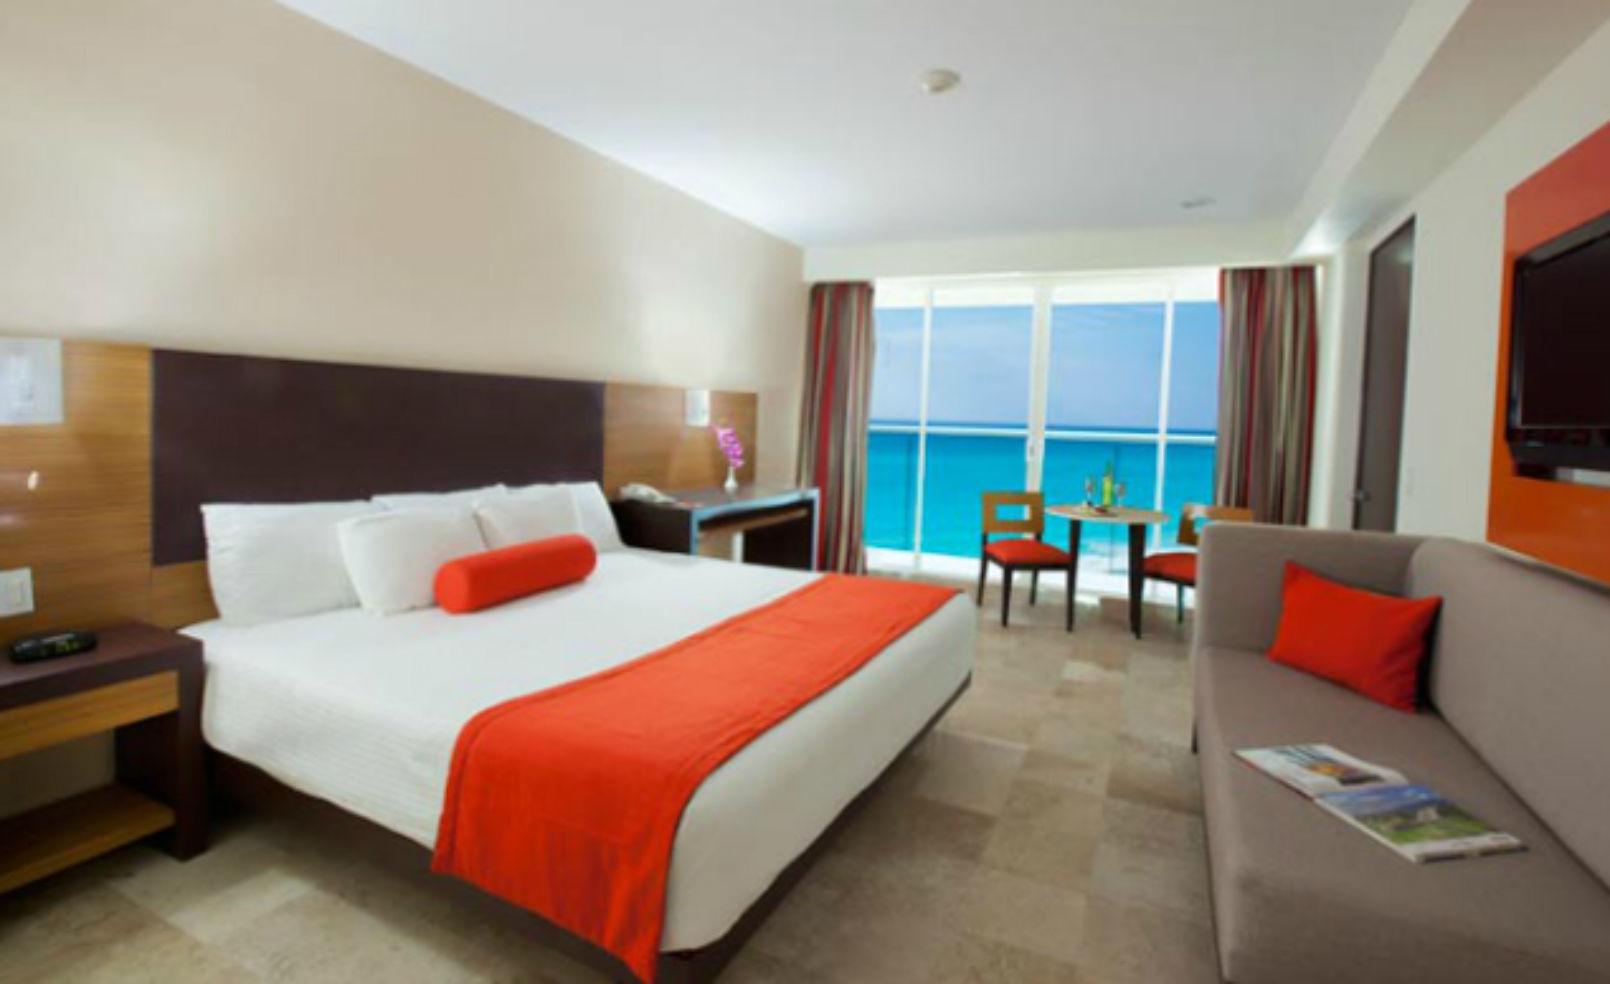 Krystal Cancun room